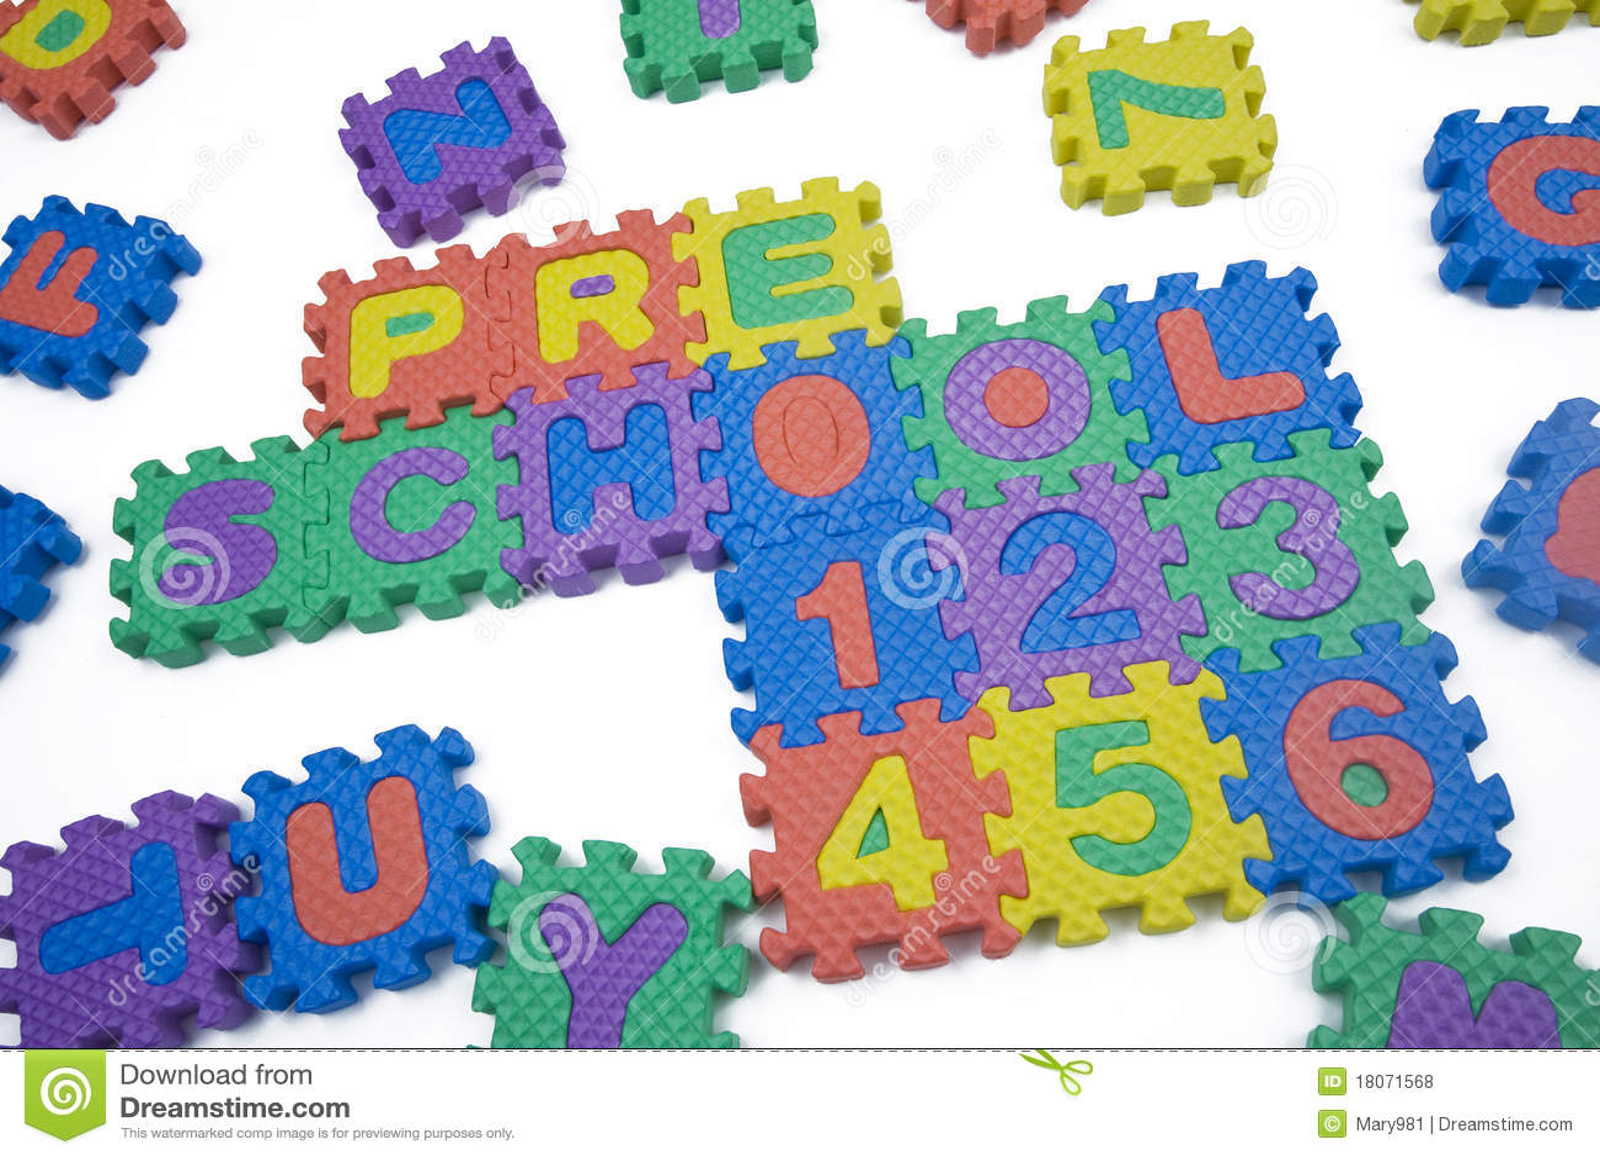 Preschool and Numbers